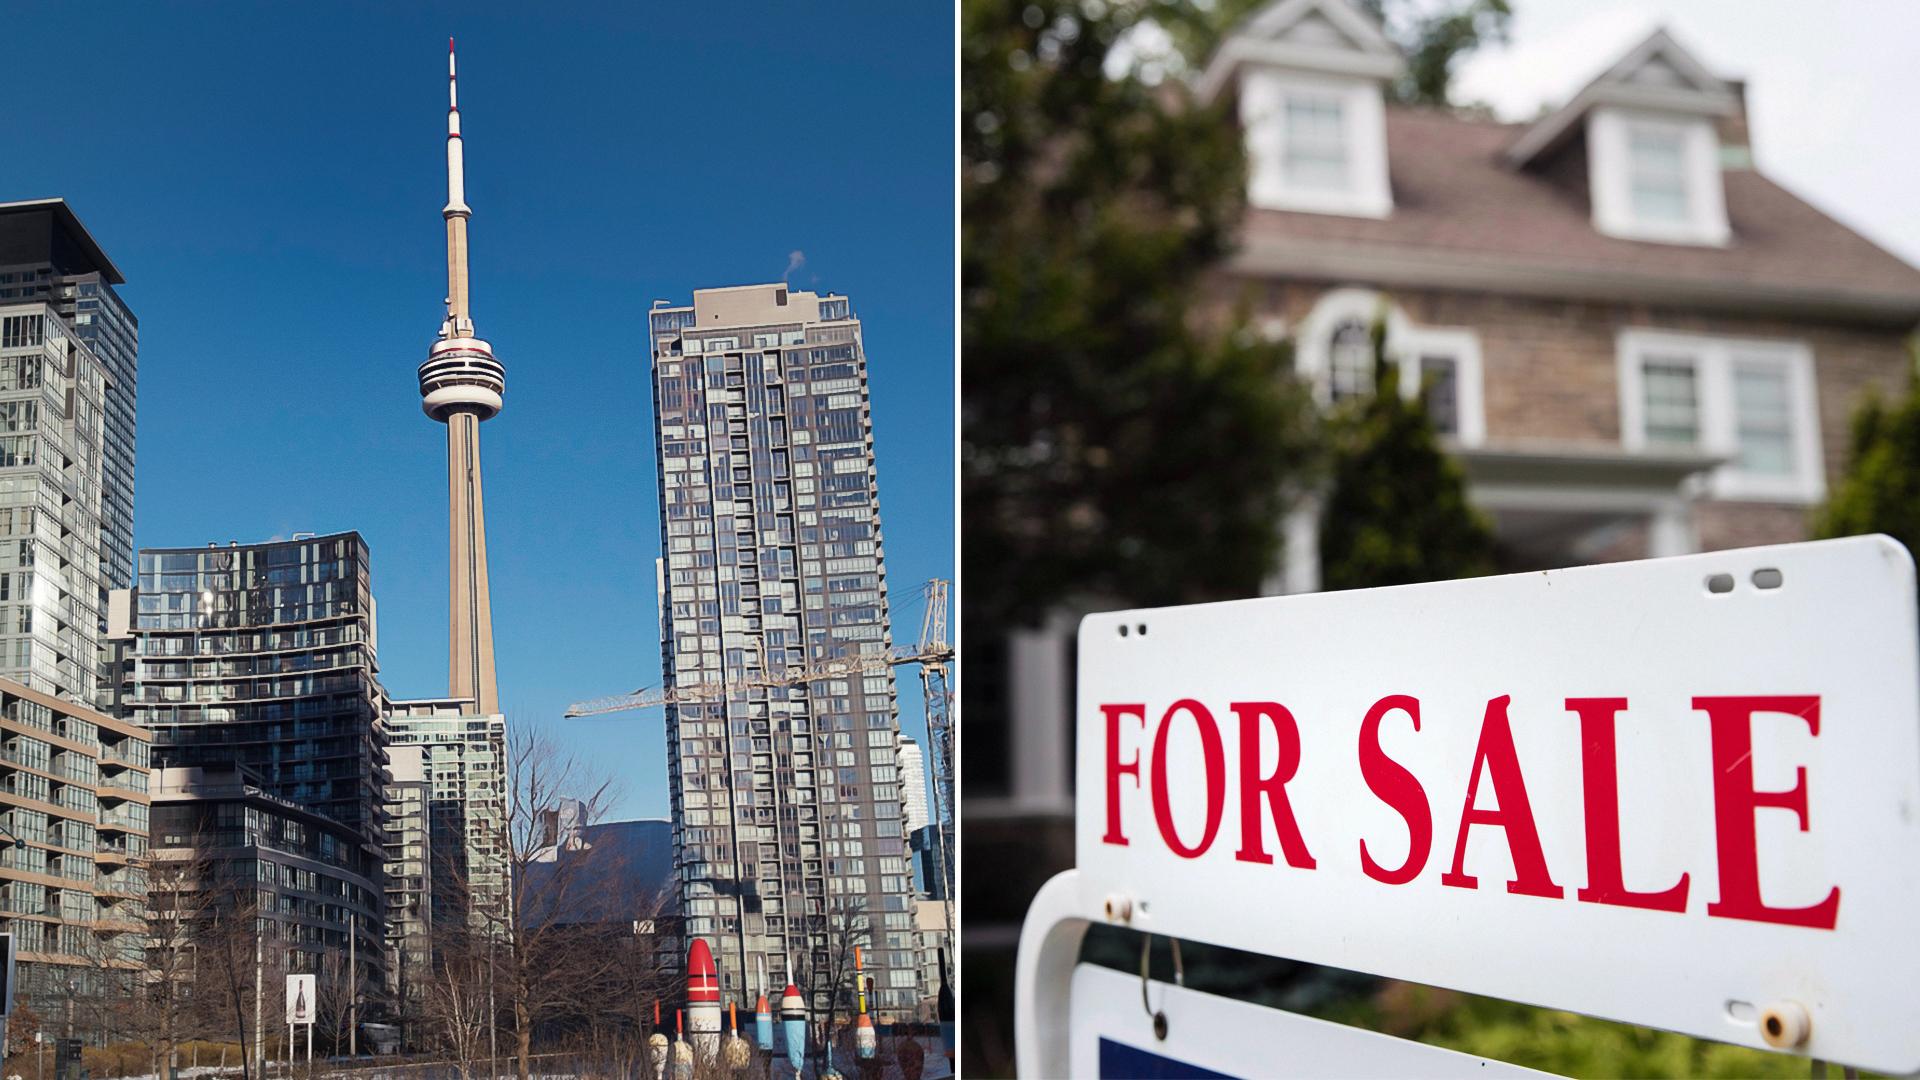 Canadas Broken Housing System Has Made It Brutal For Millennials To